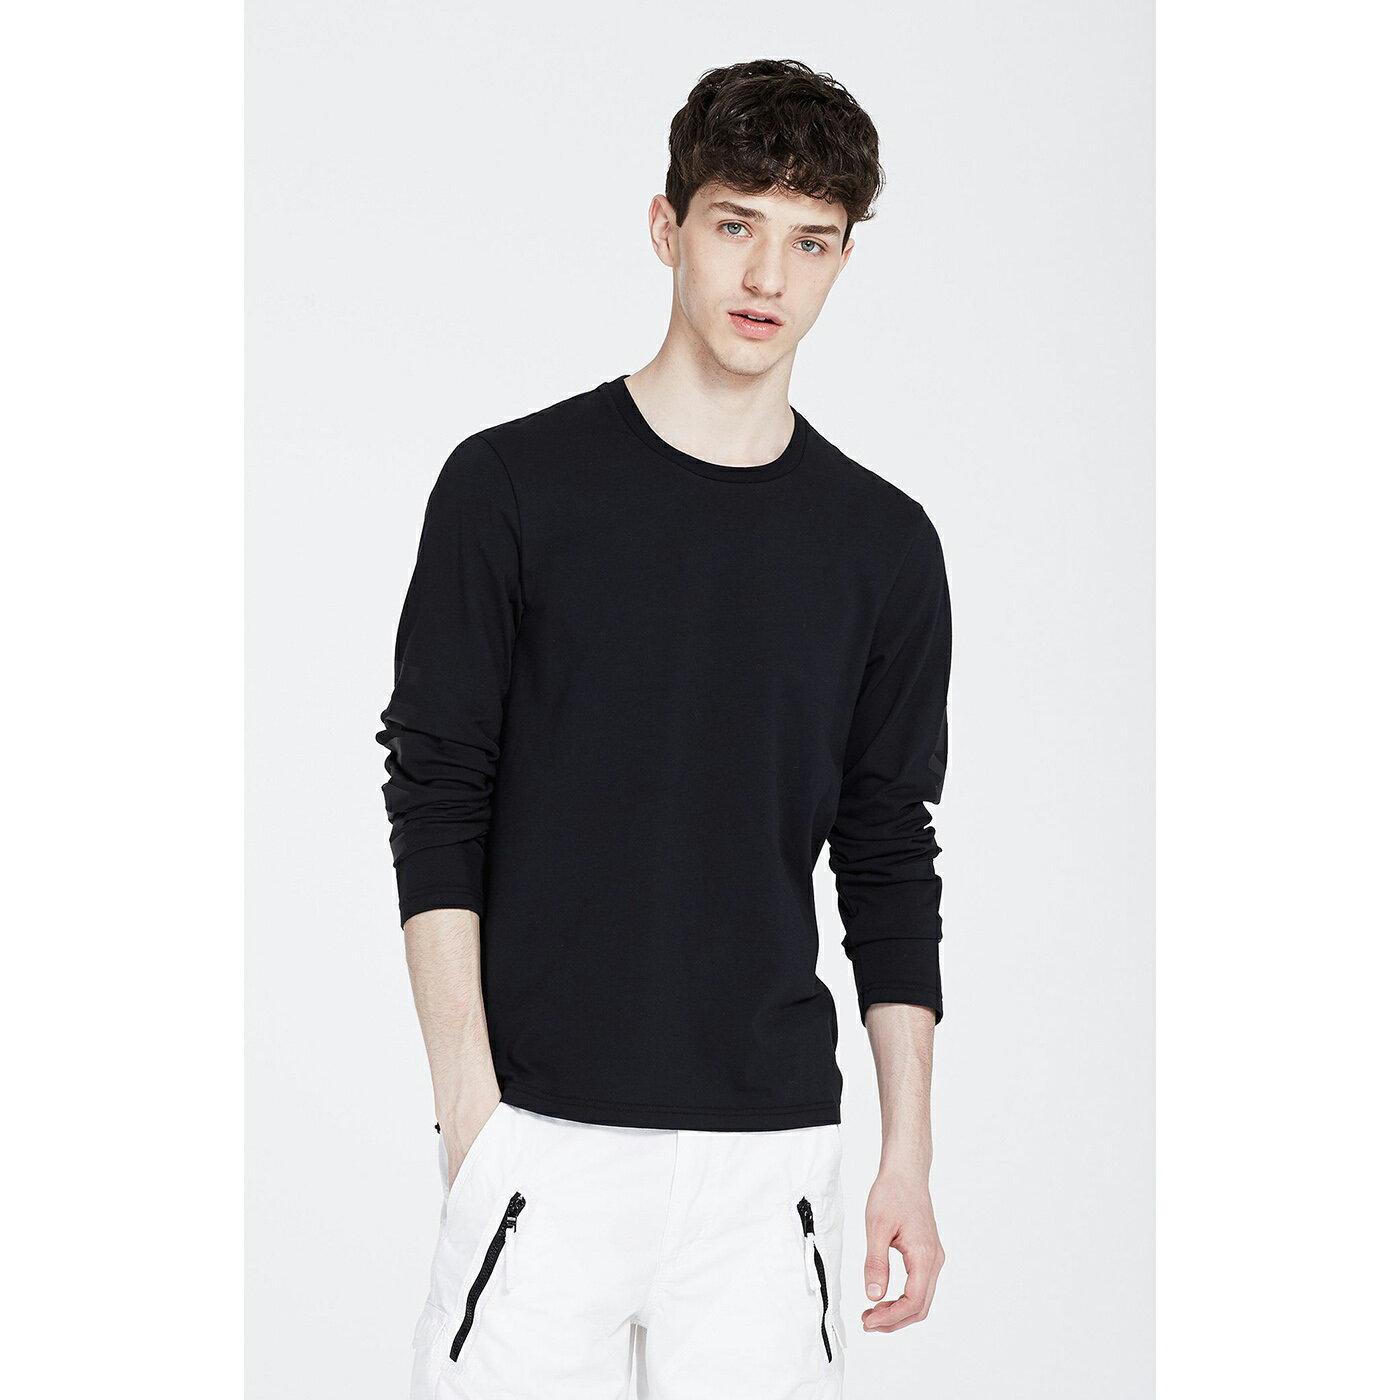 美國百分百【Armani Exchange】T恤 AX 長袖 logo 上衣 T-shirt 黑色 XS S號 F889